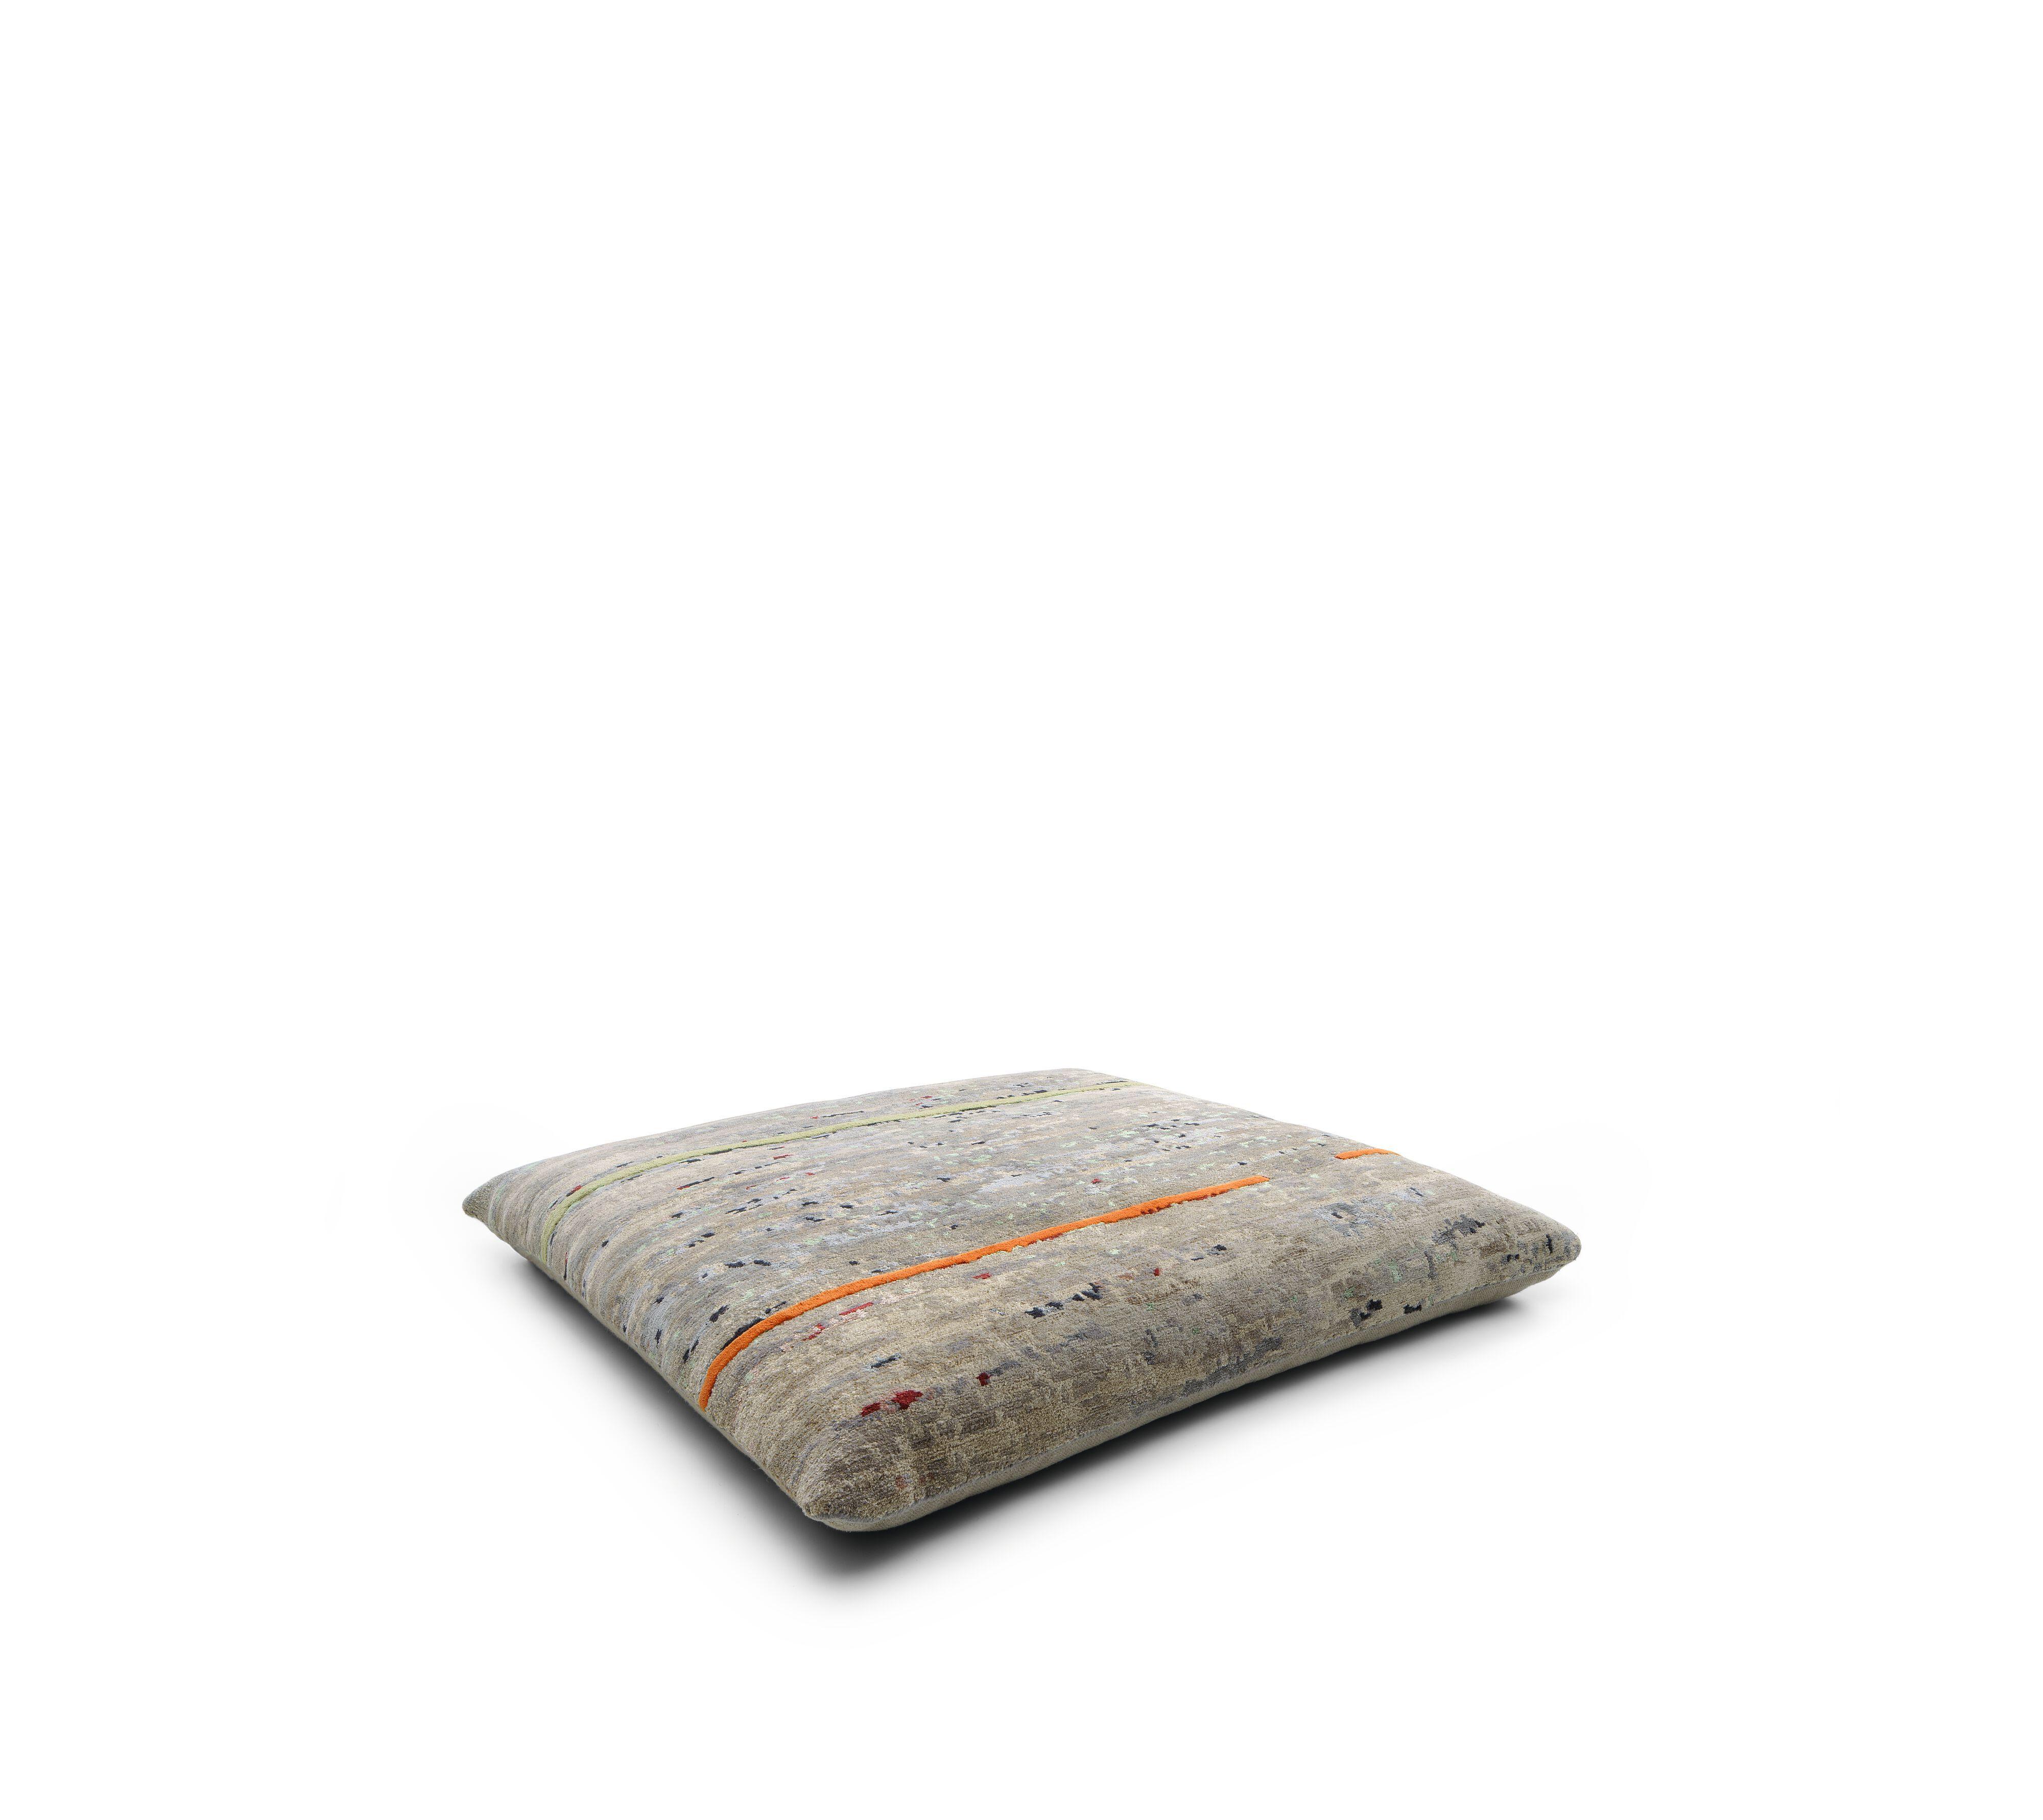 01-WK-Badawi-Pillows-Mpando-1x1-0002-H.tif